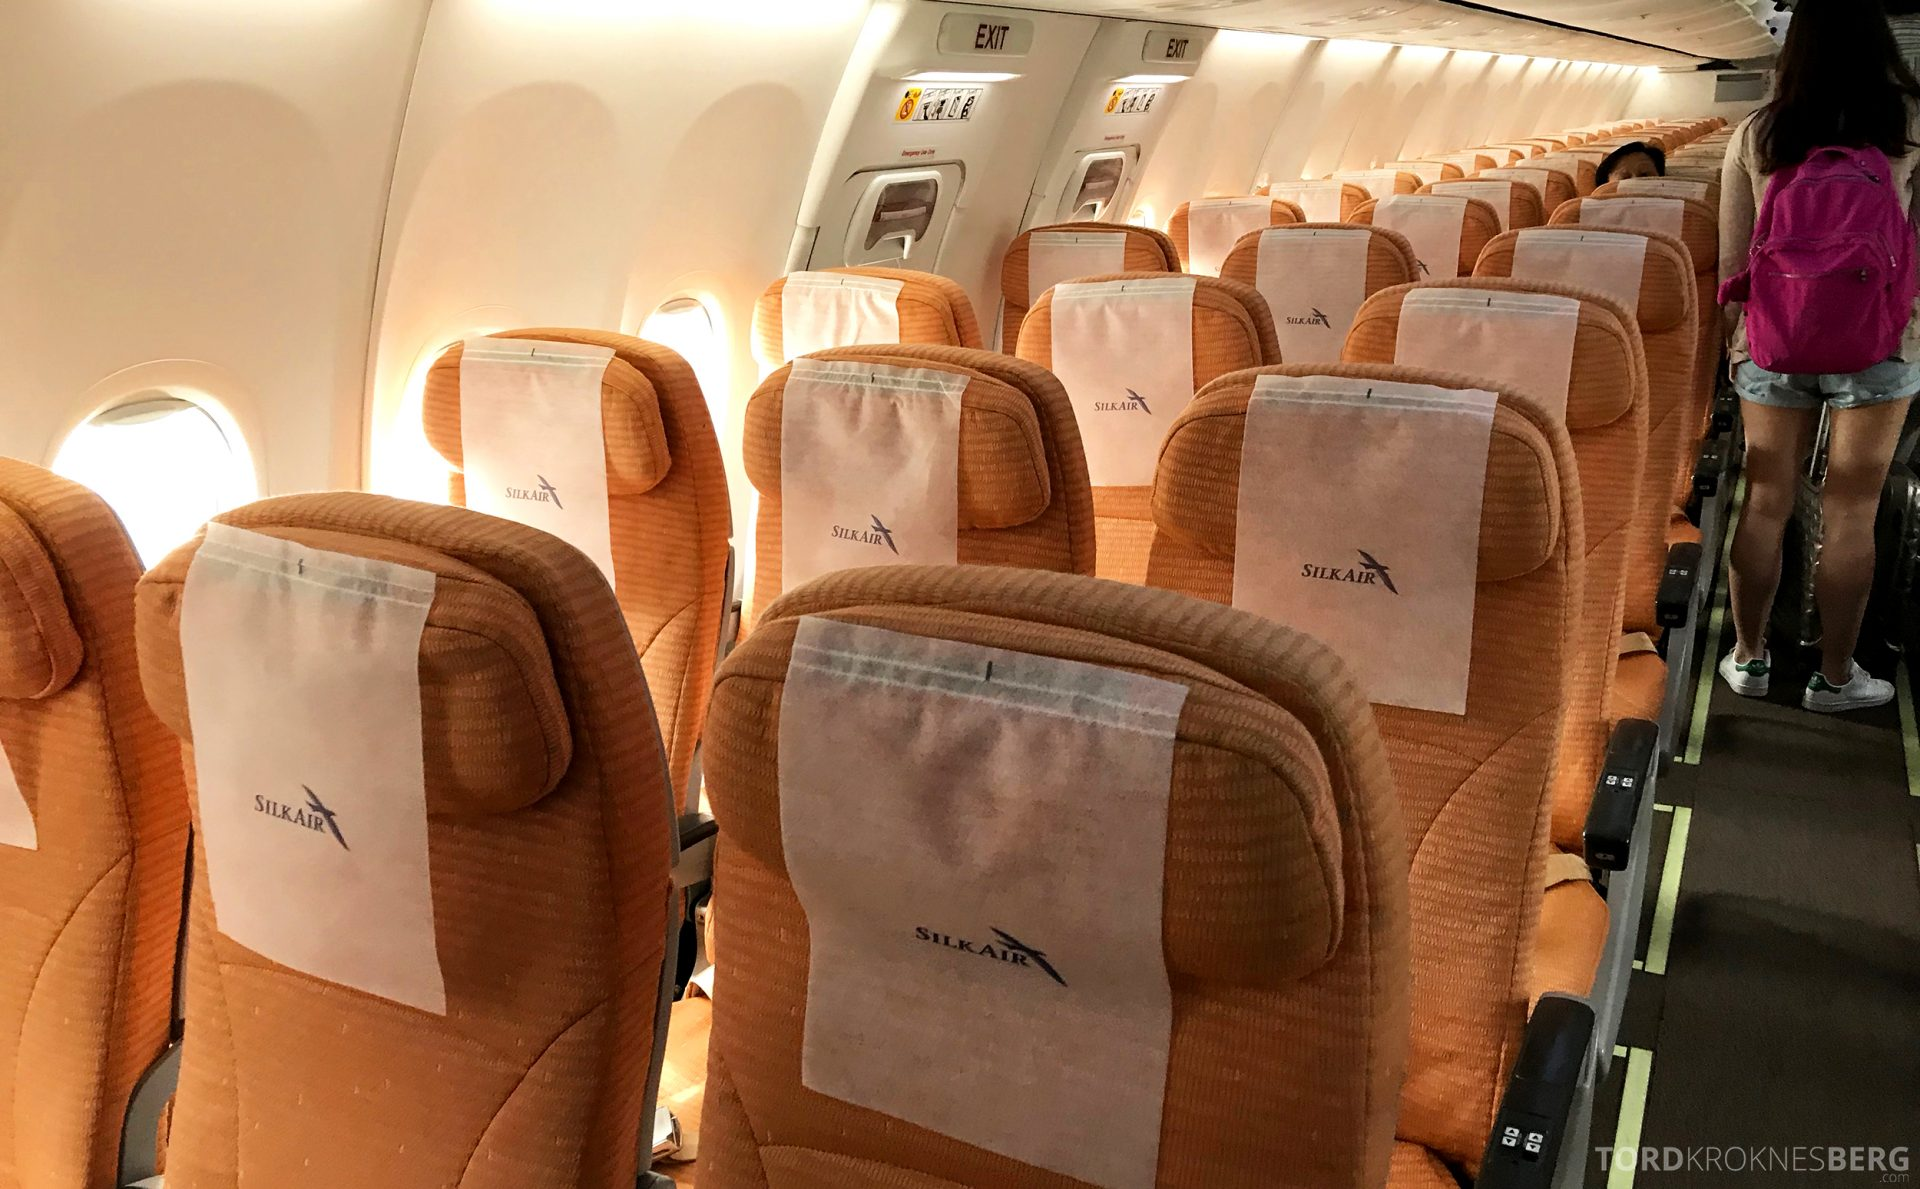 SilkAir Economy Class Penang Singapore seter